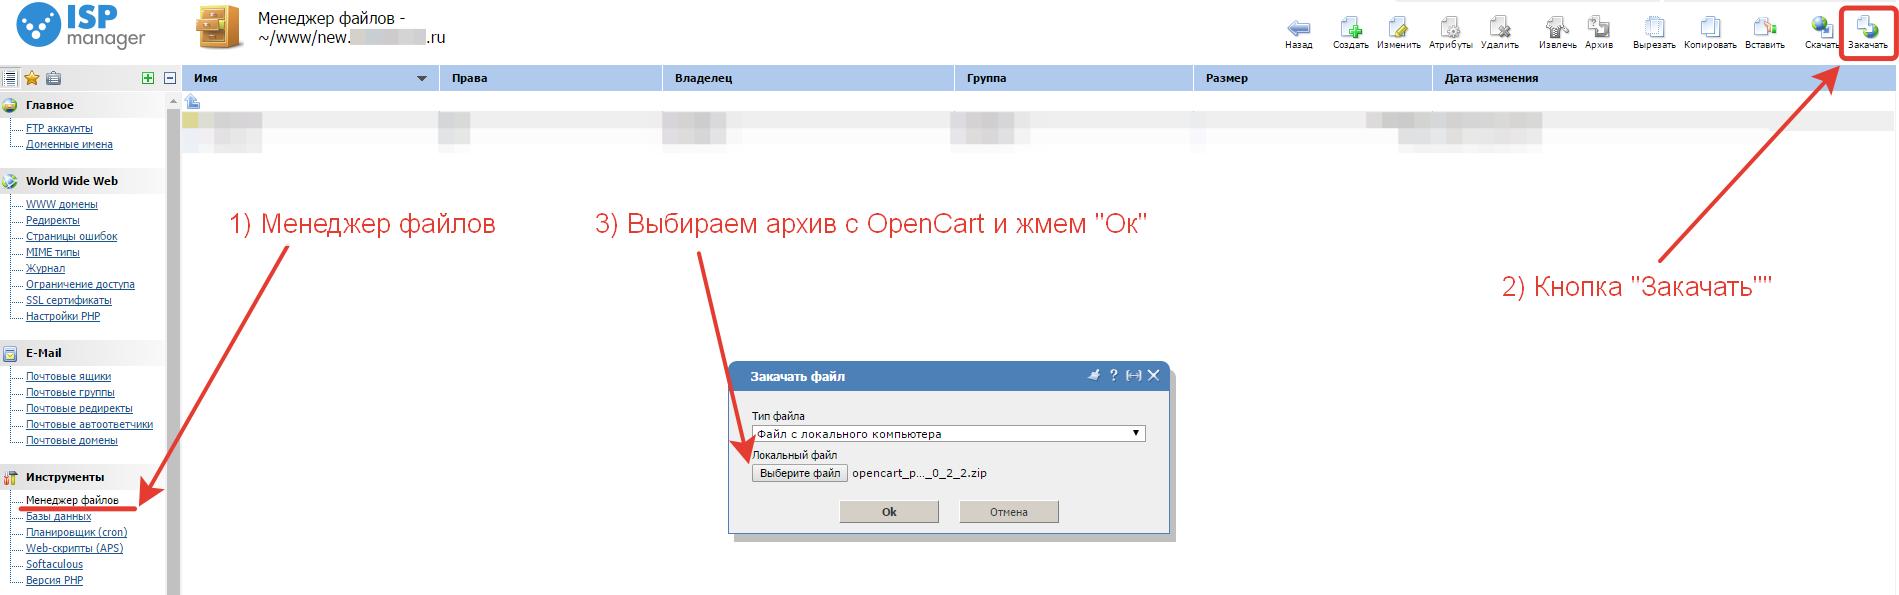 Установка опенкарт на хостинг ispmanager хостинг файл с ссылкой